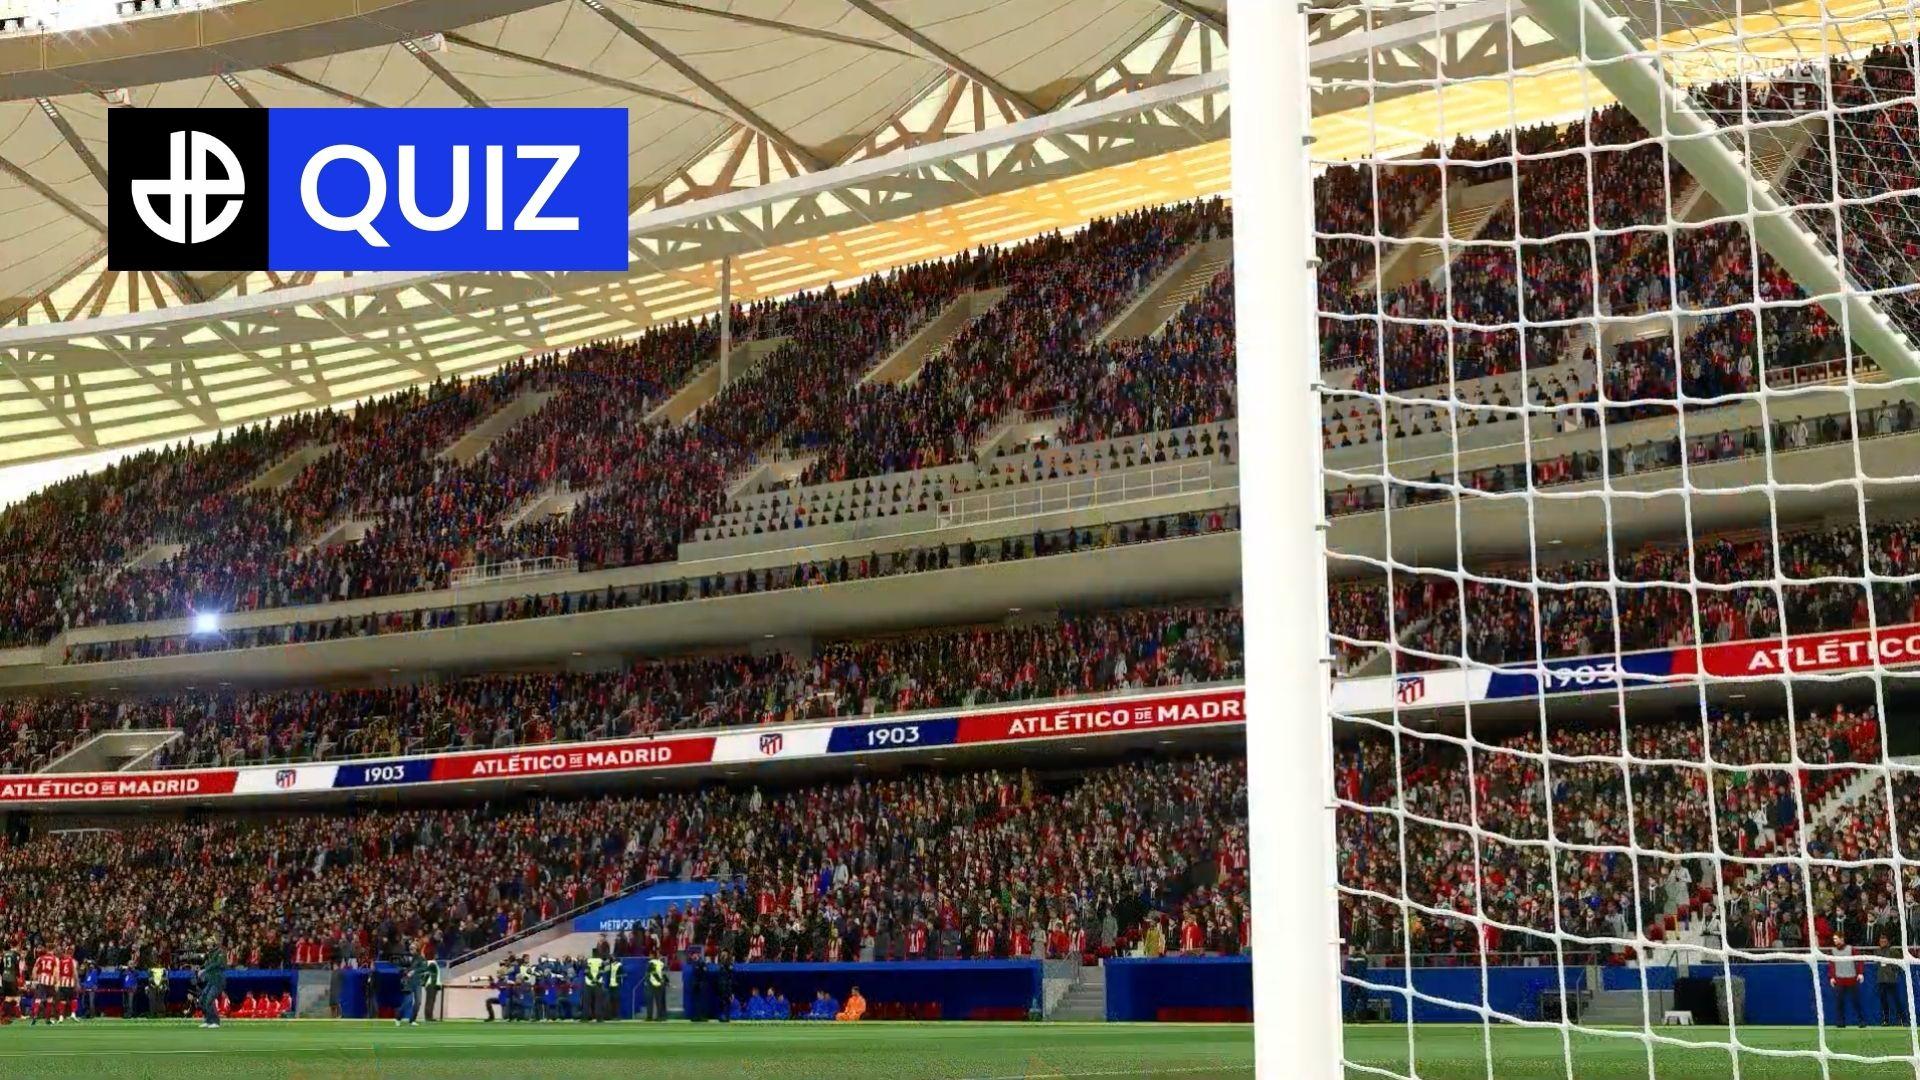 FIFA 21 stadium wanda metropolitano